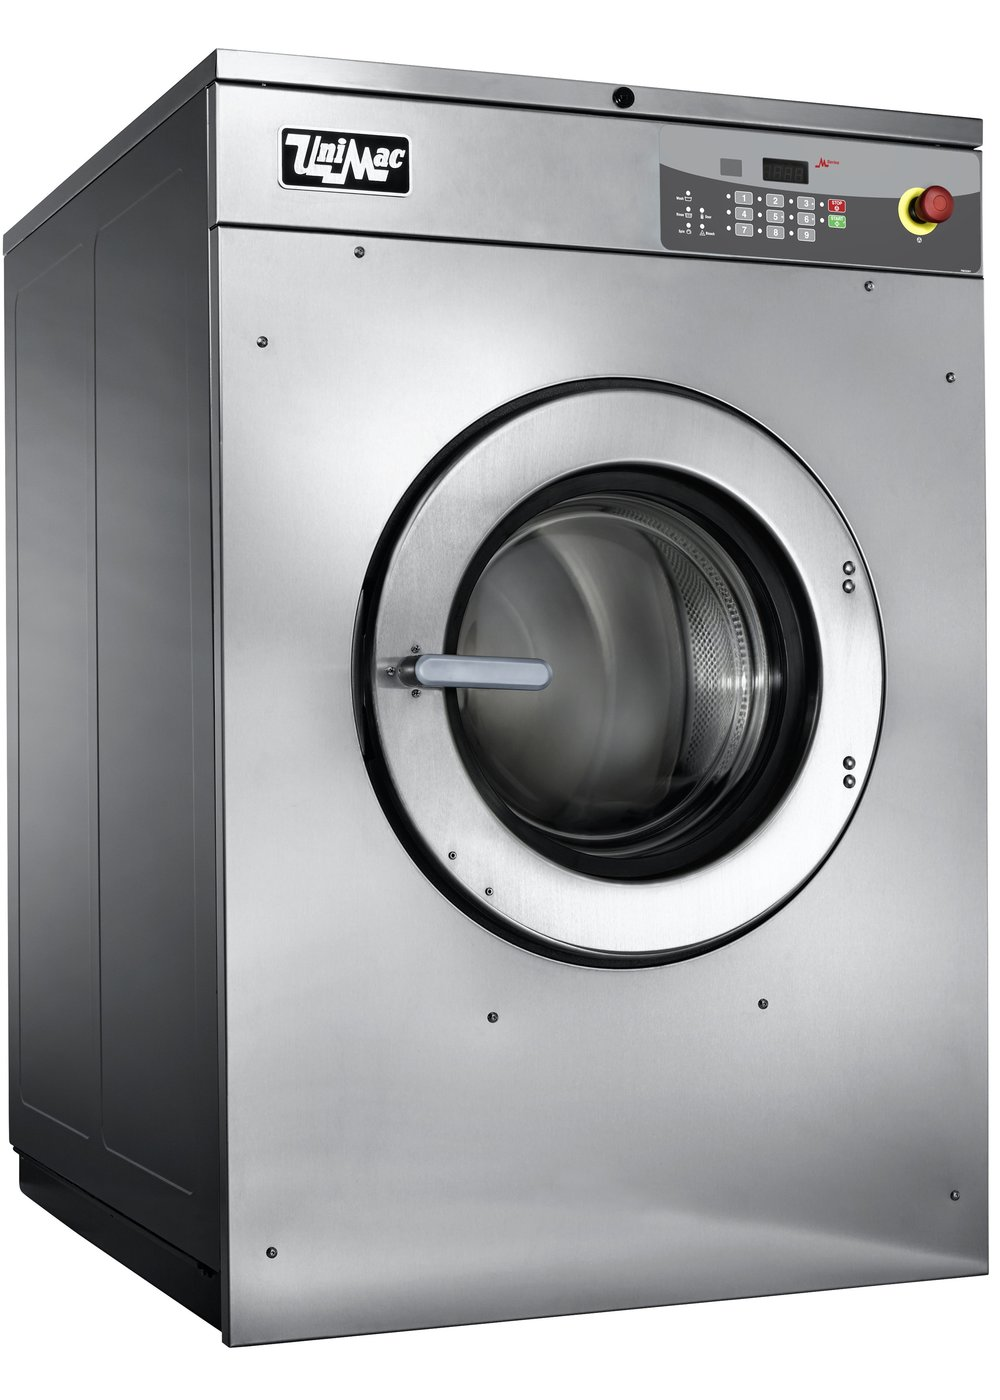 Bunker suits UniMac washer-extractor  Commercial washer for bunker suits  Washer for bunker suits  Robust commercial washer  Bunker suits washer